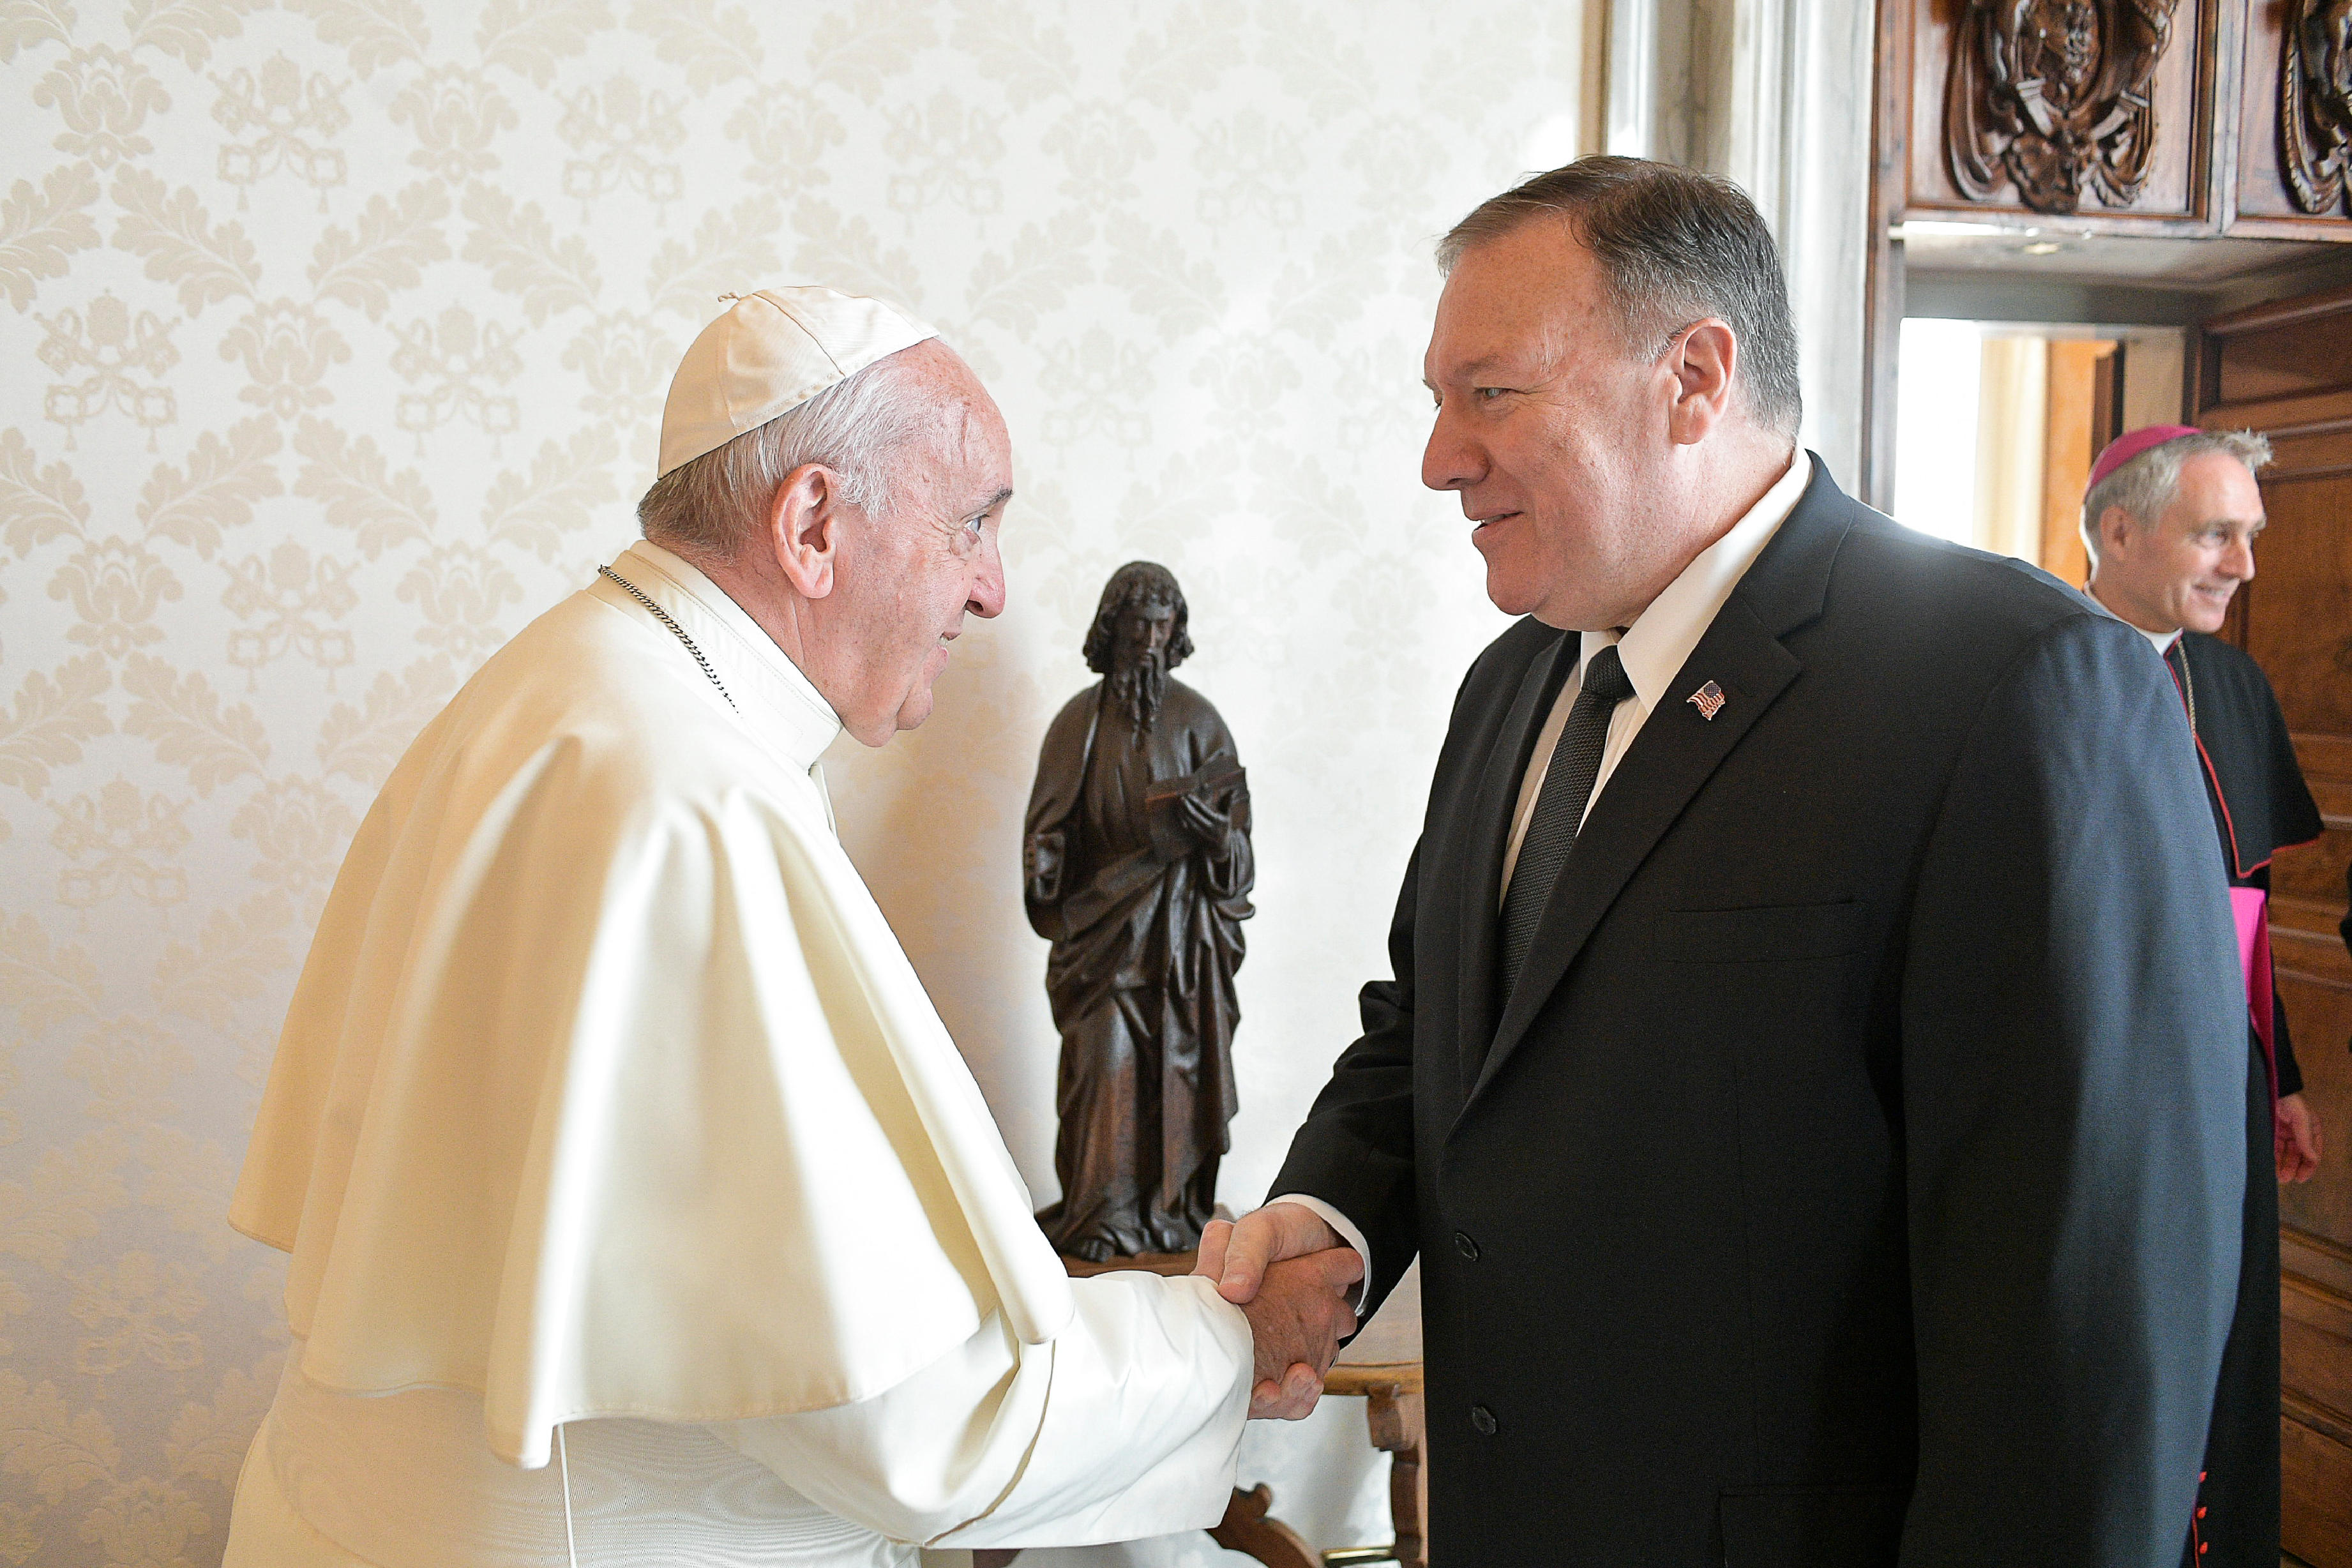 Scolding China, Pompeo proposes U.S./Vatican alliance on religious freedom  | America Magazine